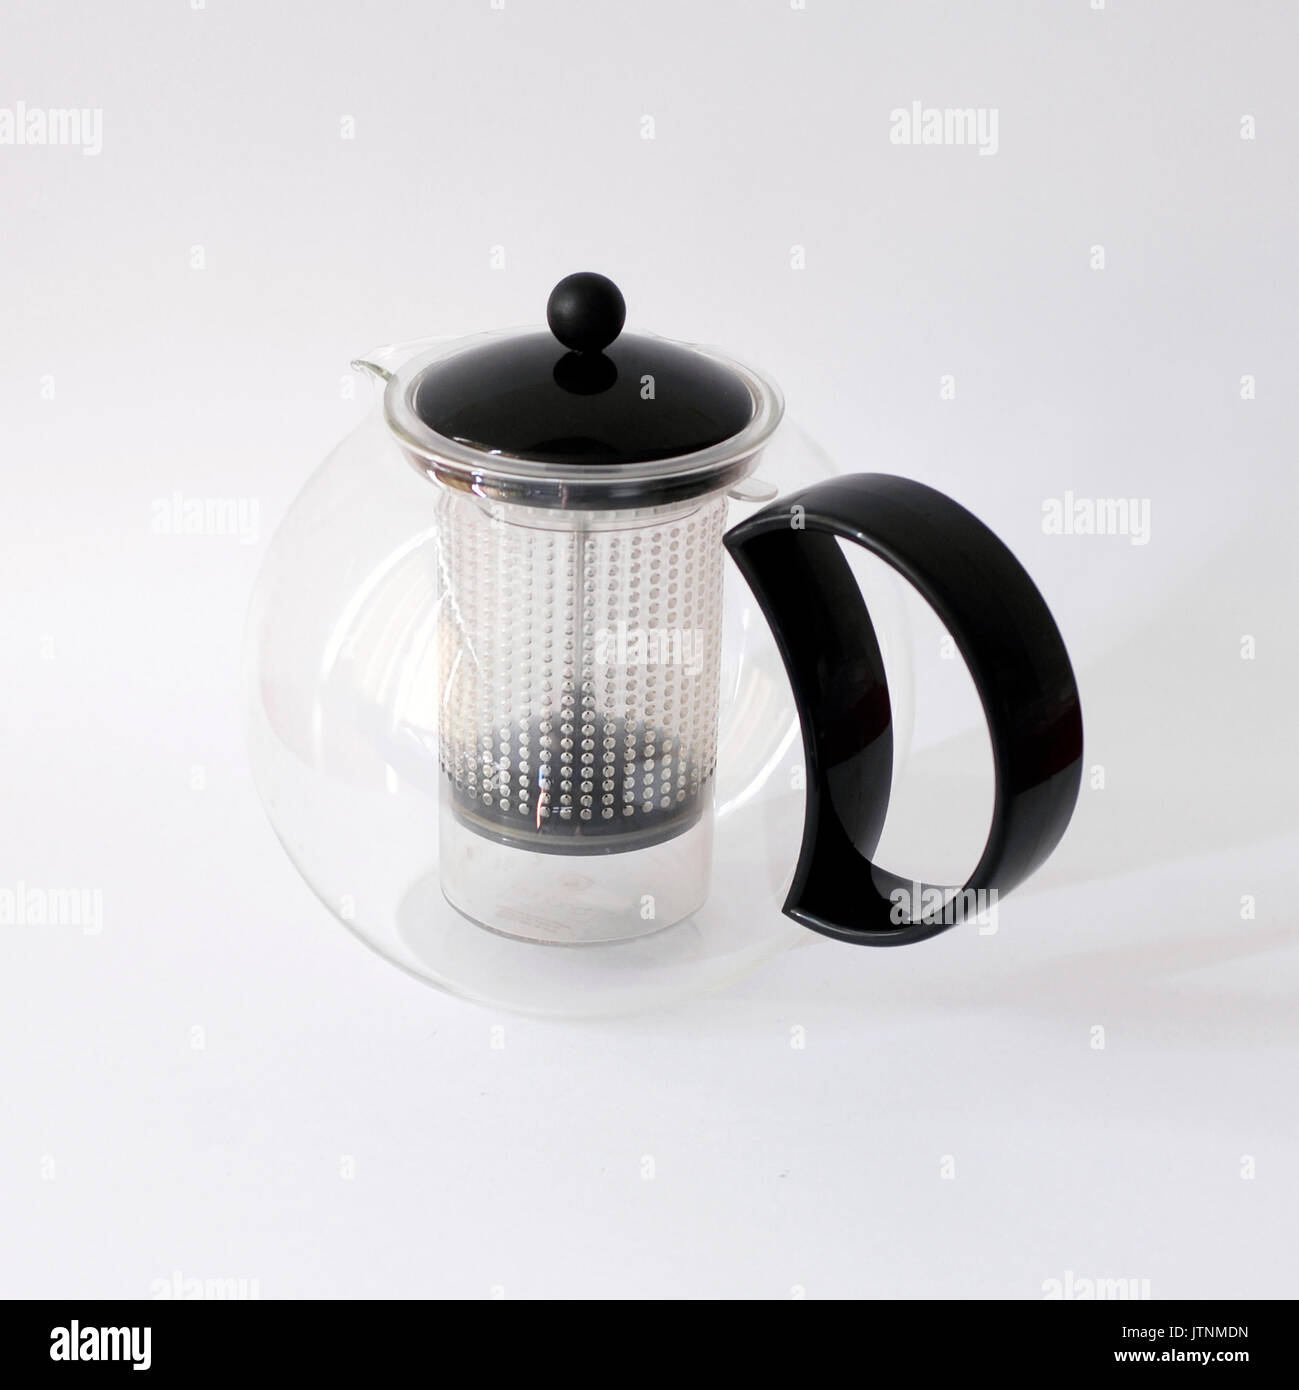 Vintage teapot designed by Jorgensen for BODUM, Made in Switzerland - Stock Image